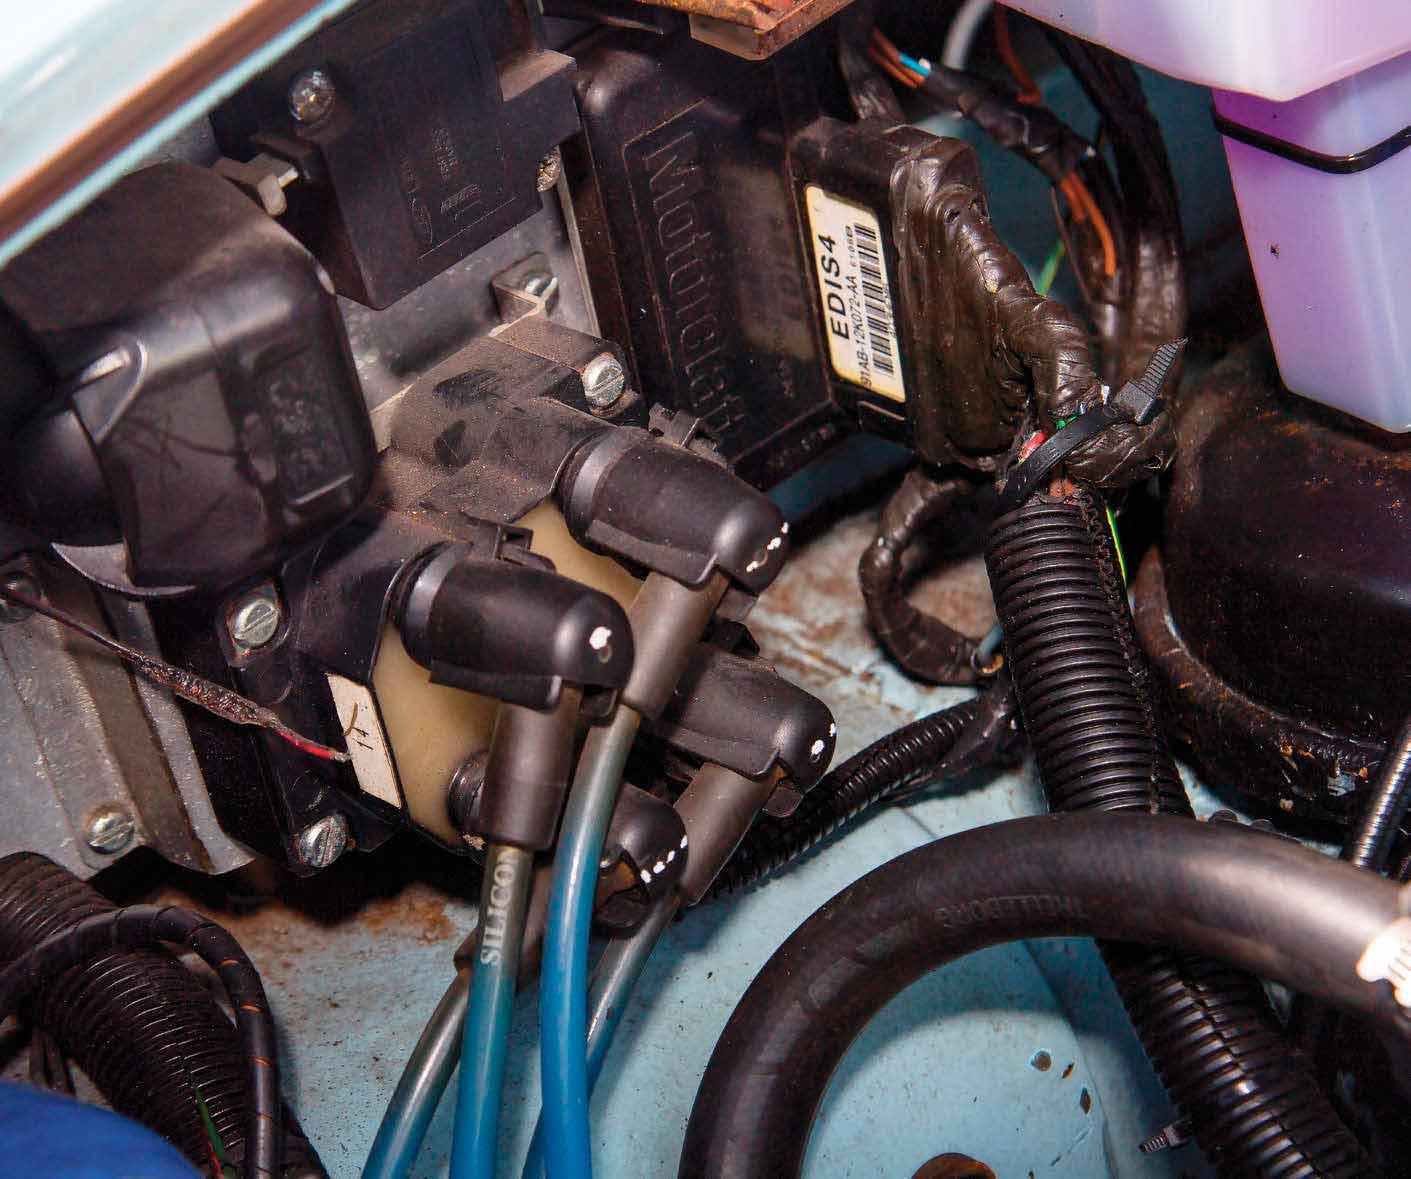 Austin A35 Turbo - MG Midget engined monster - Drive-My